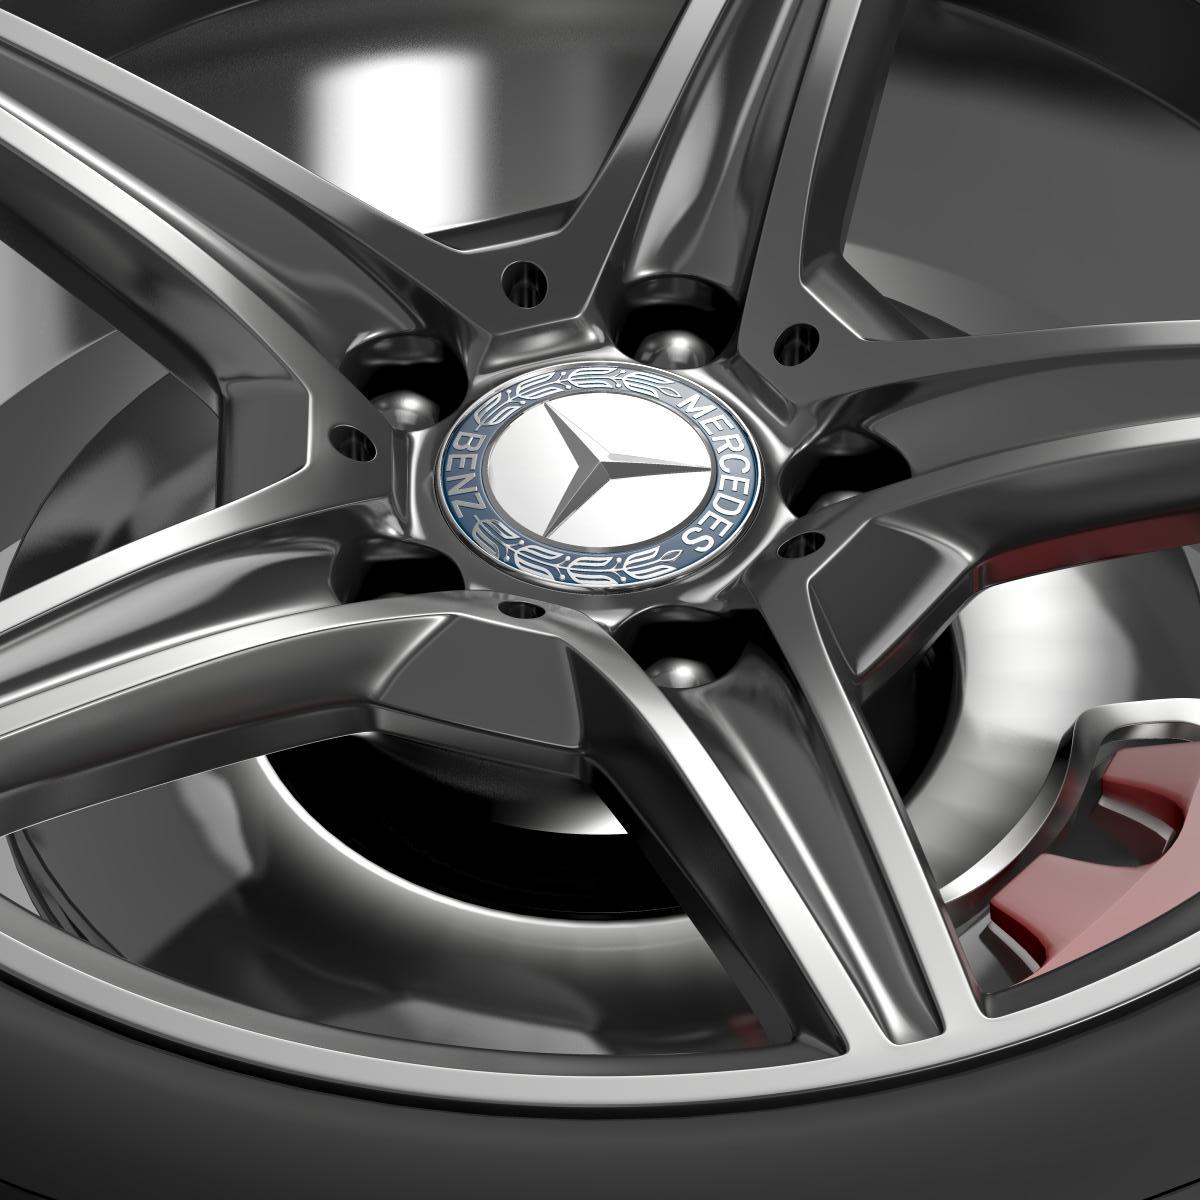 mercedes benz c 400 4matic amg line wheel 3d model 3ds max fbx c4d lwo ma mb hrc xsi obj 210787